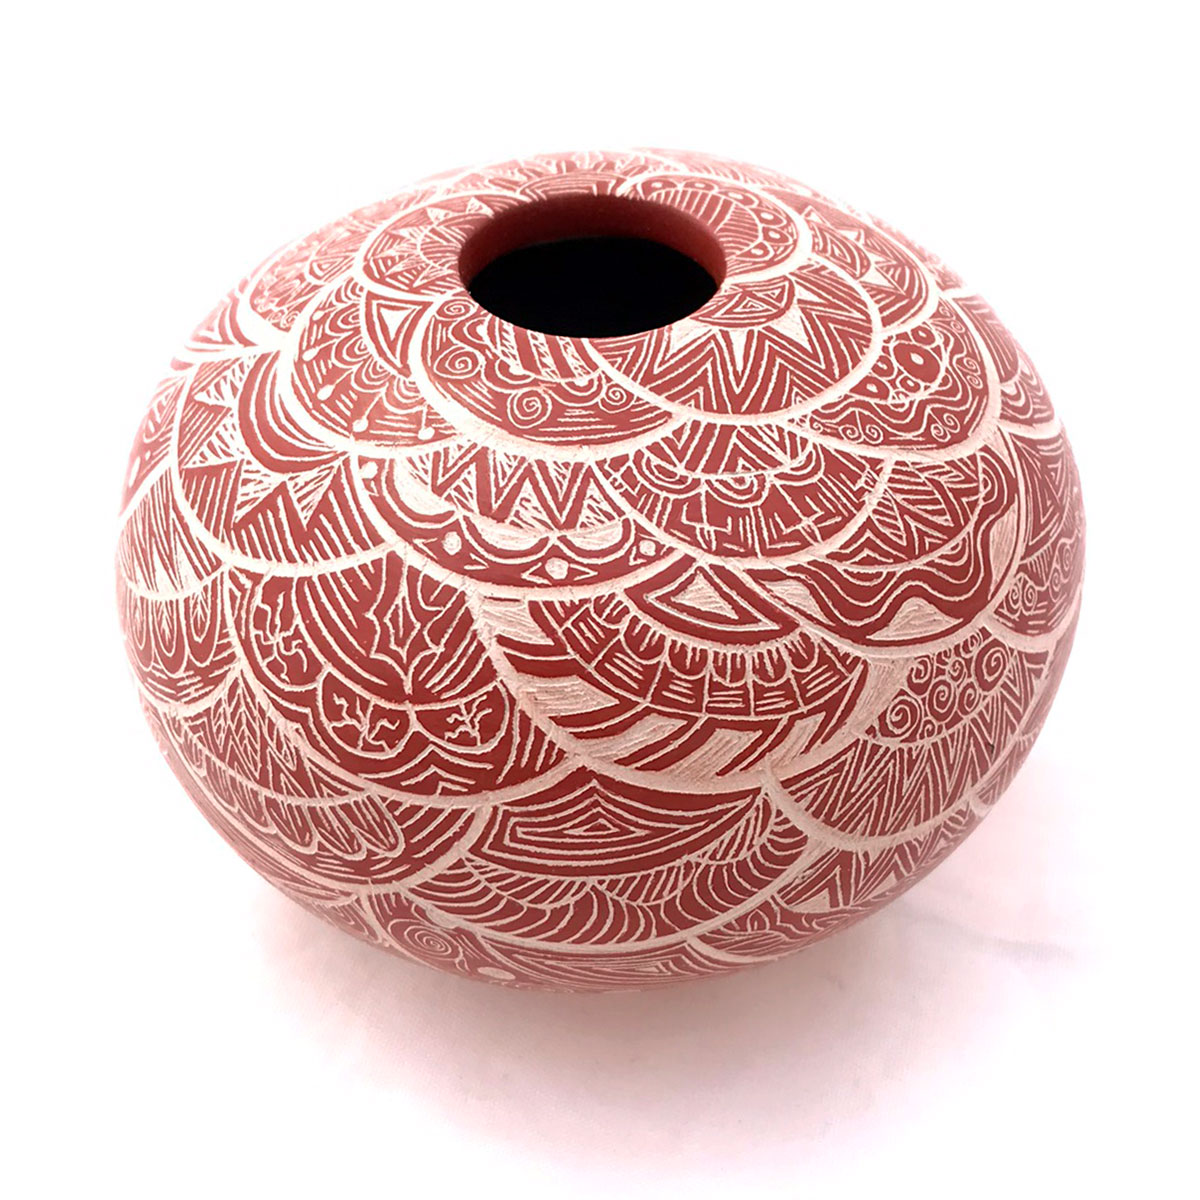 Paula Gallegos Bugarini Paula Gallegos Bugarini: Small Fine Red on Tan Geometric Geometric